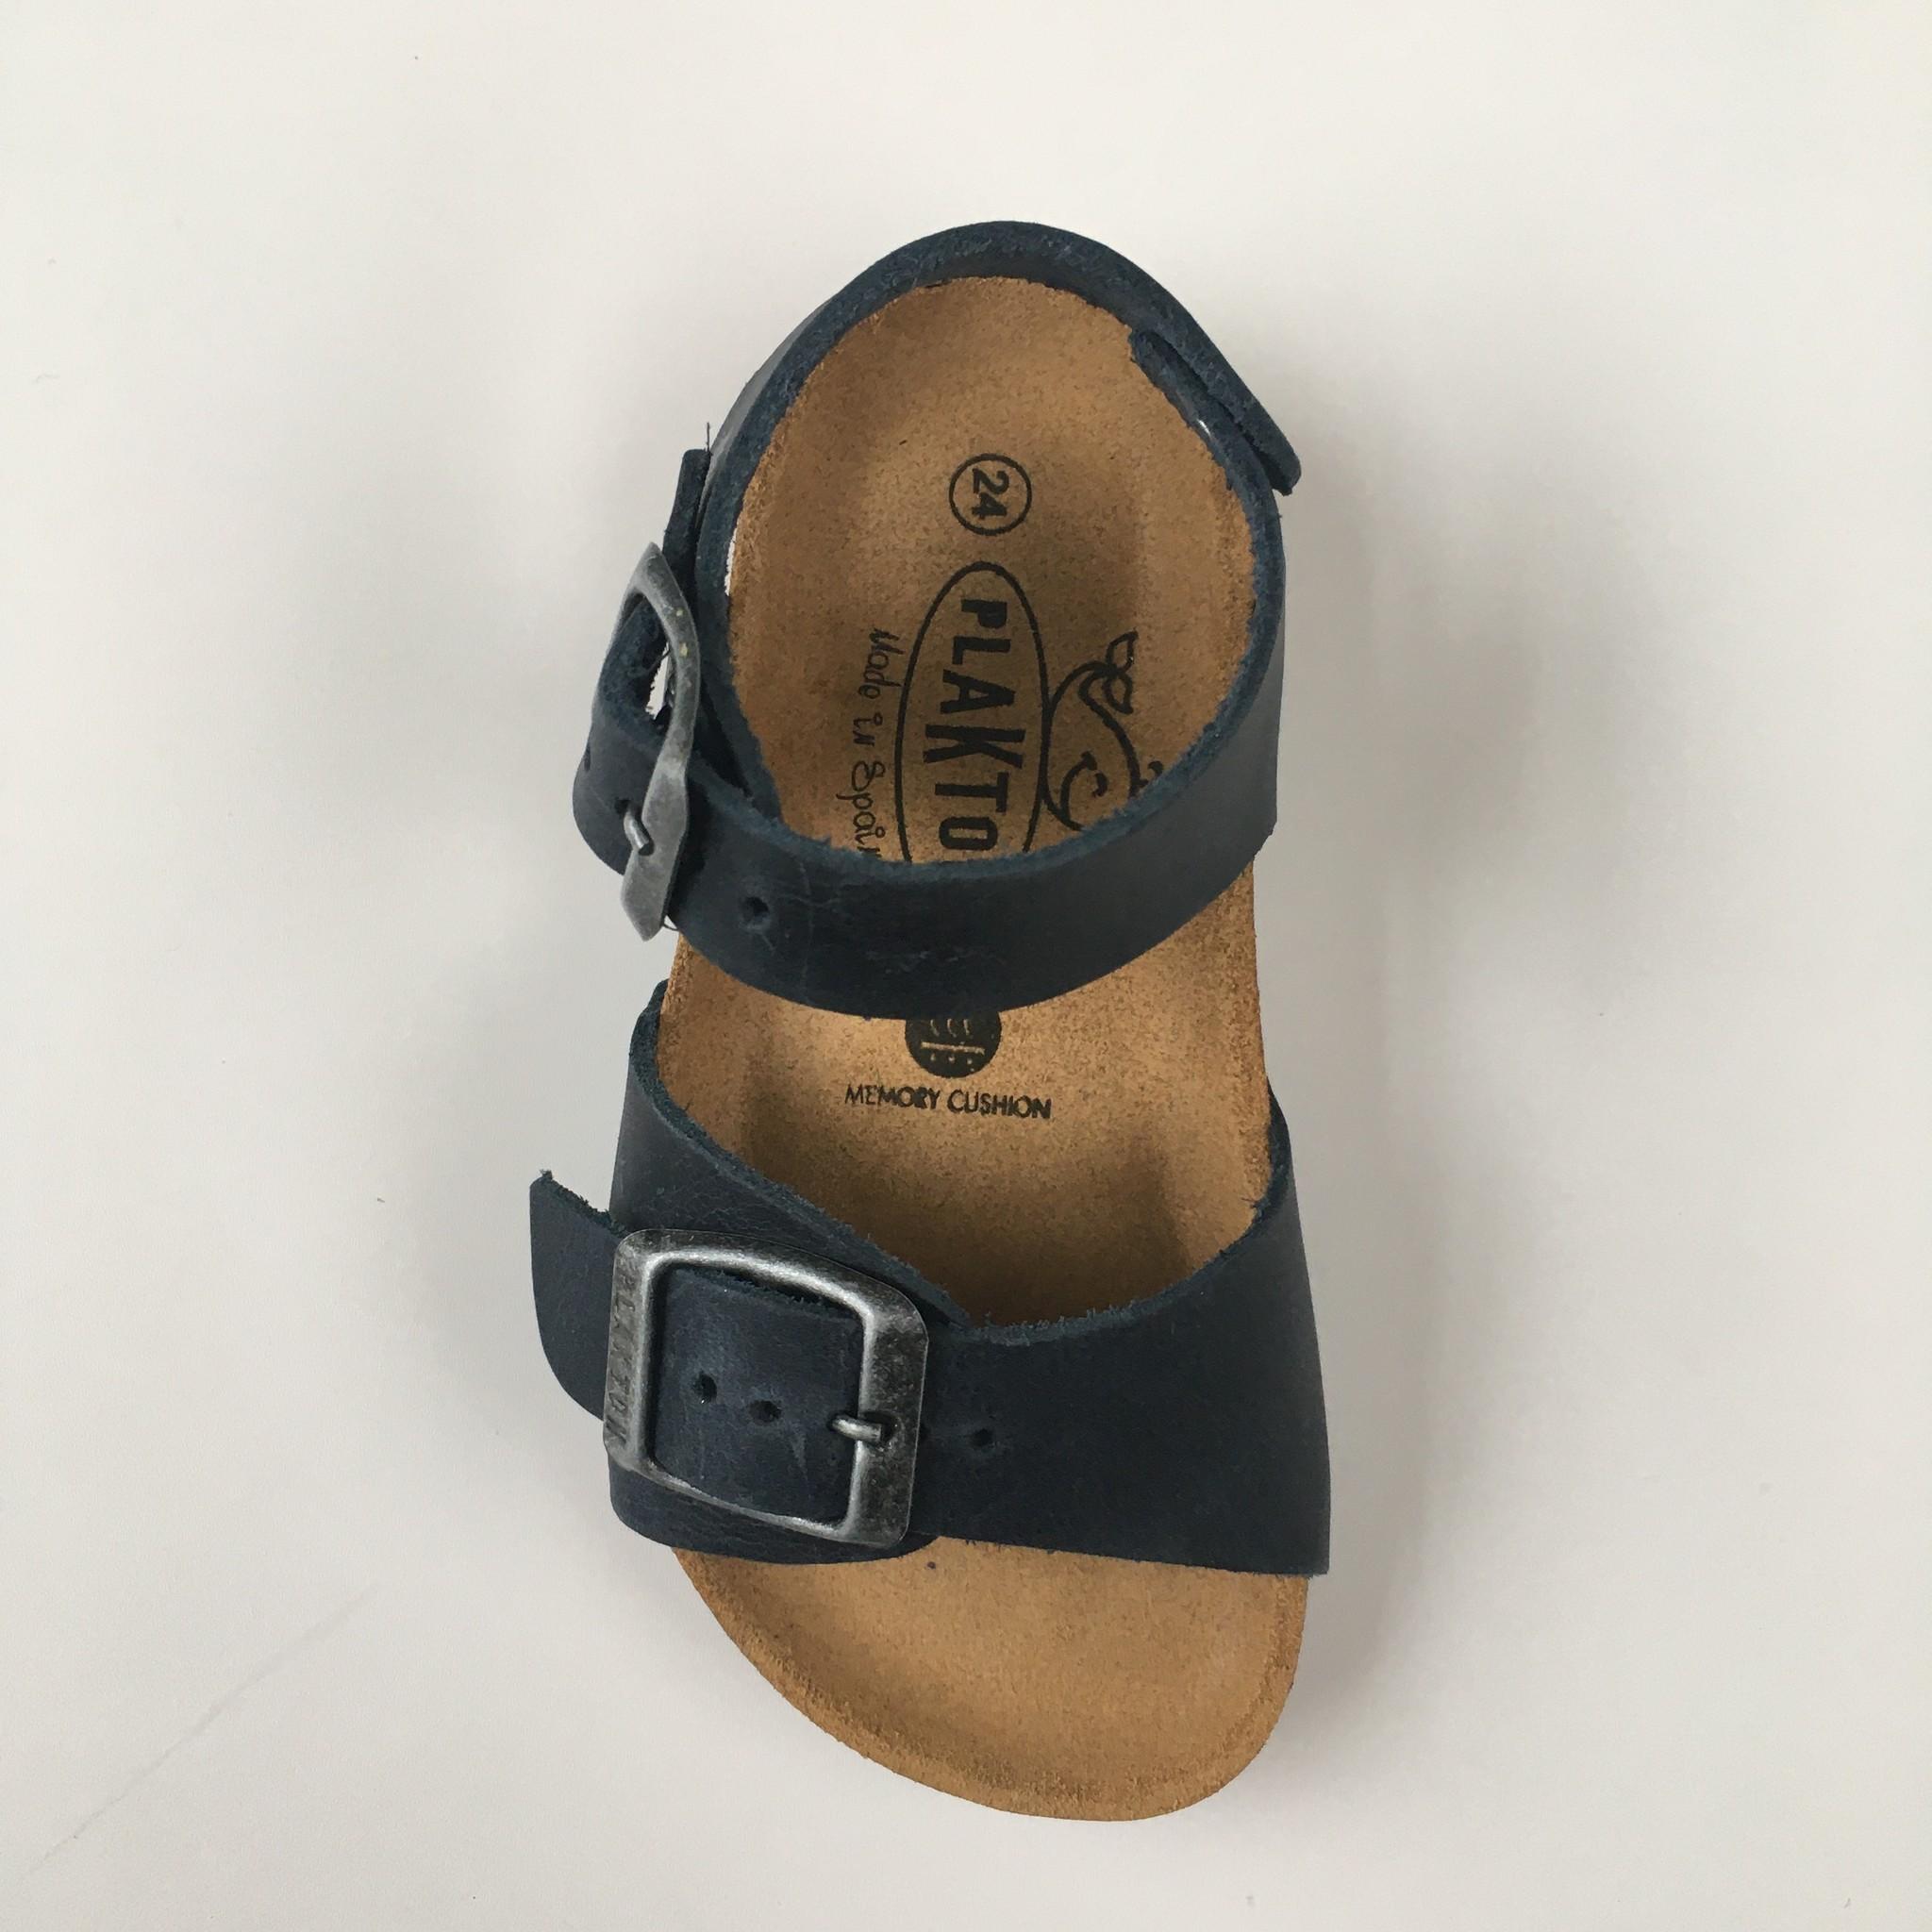 PLAKTON SANDALS leather cork sandal child LOUIS - roughened leather mat - dark blue - 24 to 35